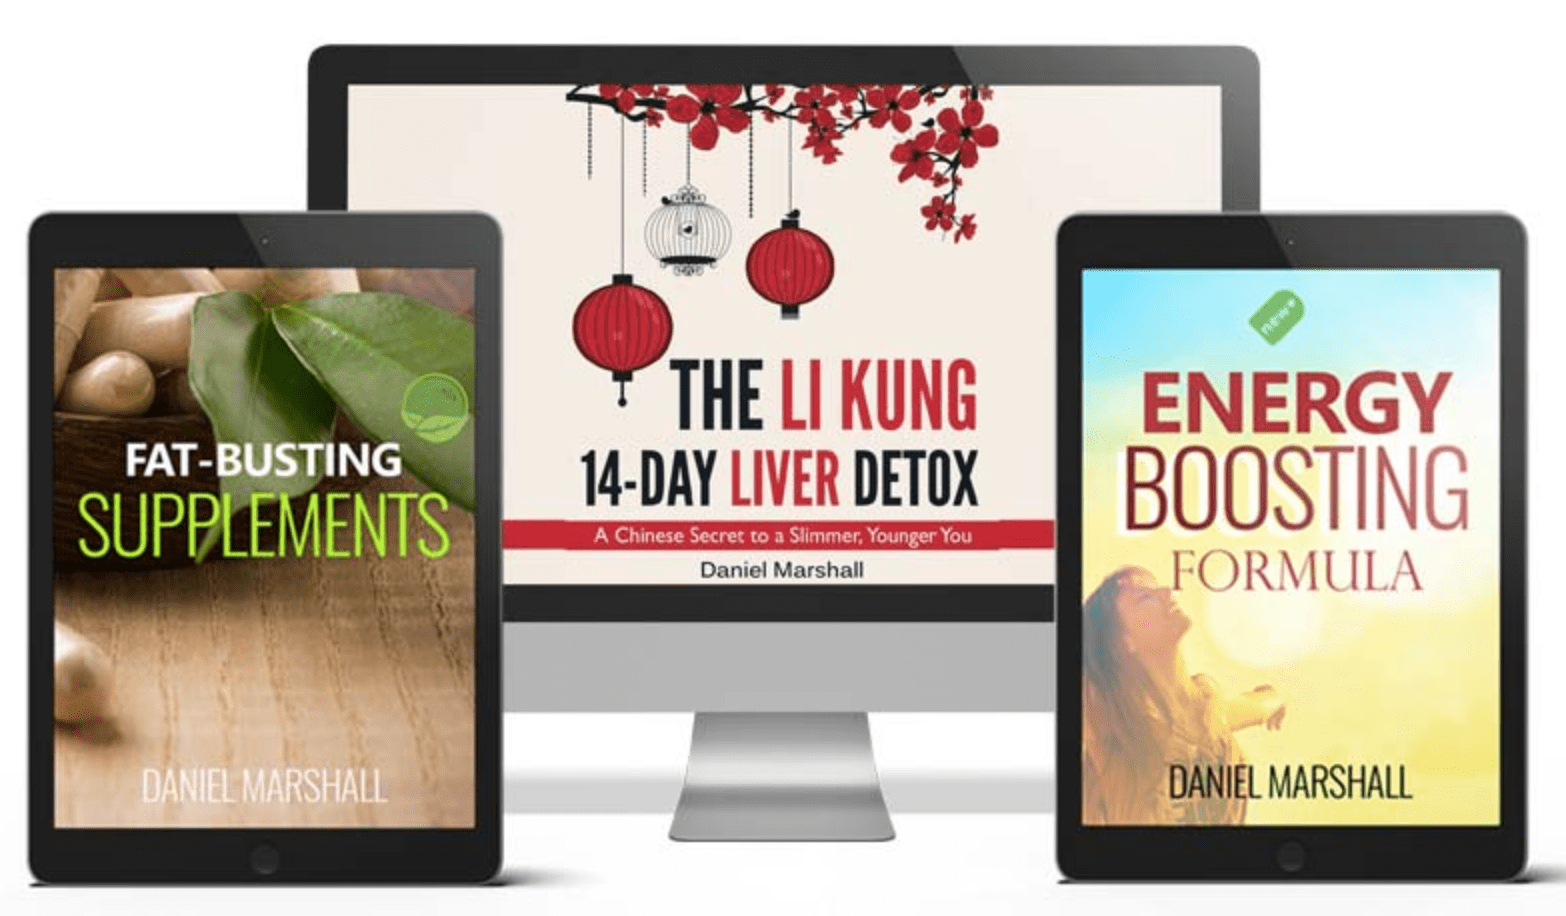 The Li Kung 14 Day Liver Detox reviews